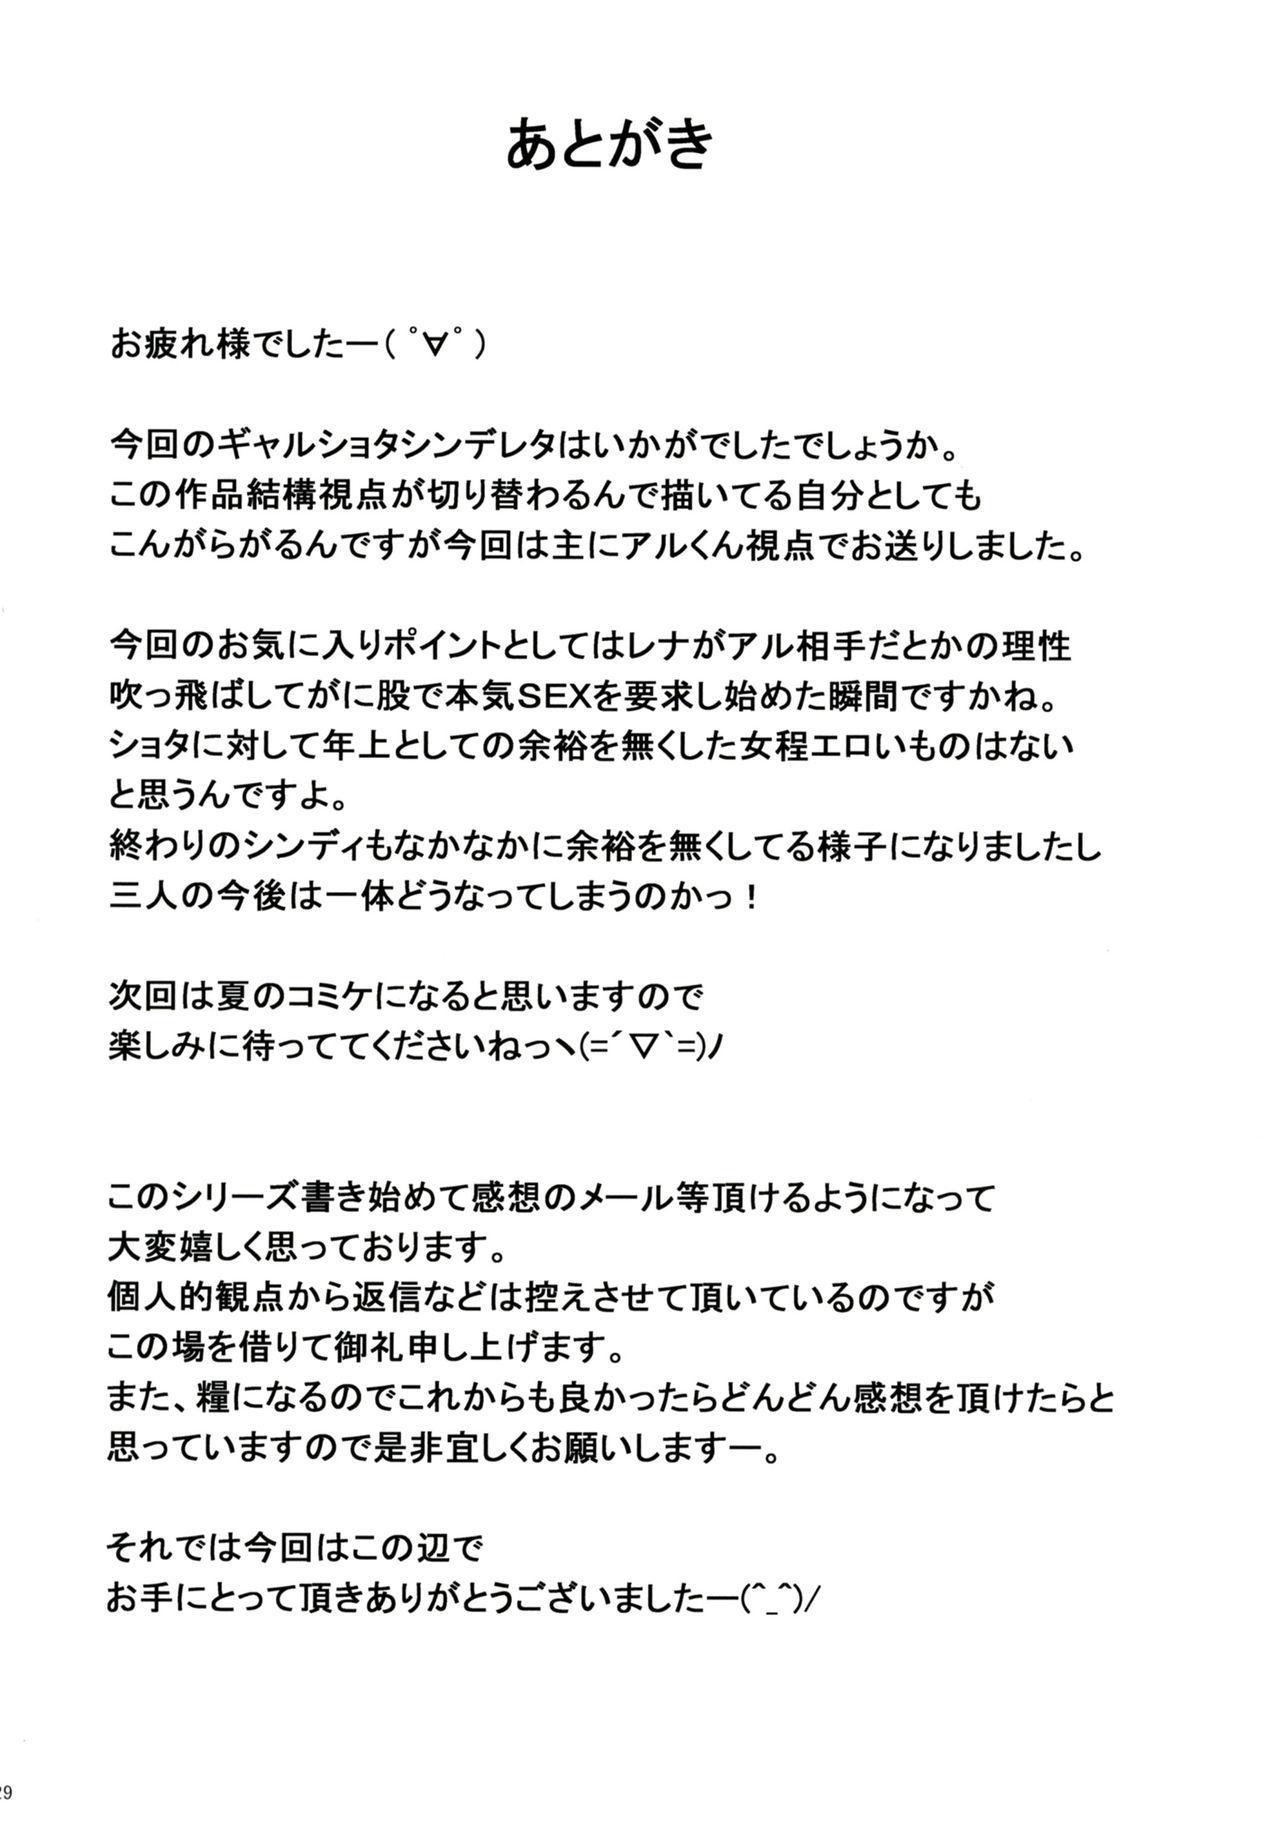 Gal Shota Cinderella 4 27